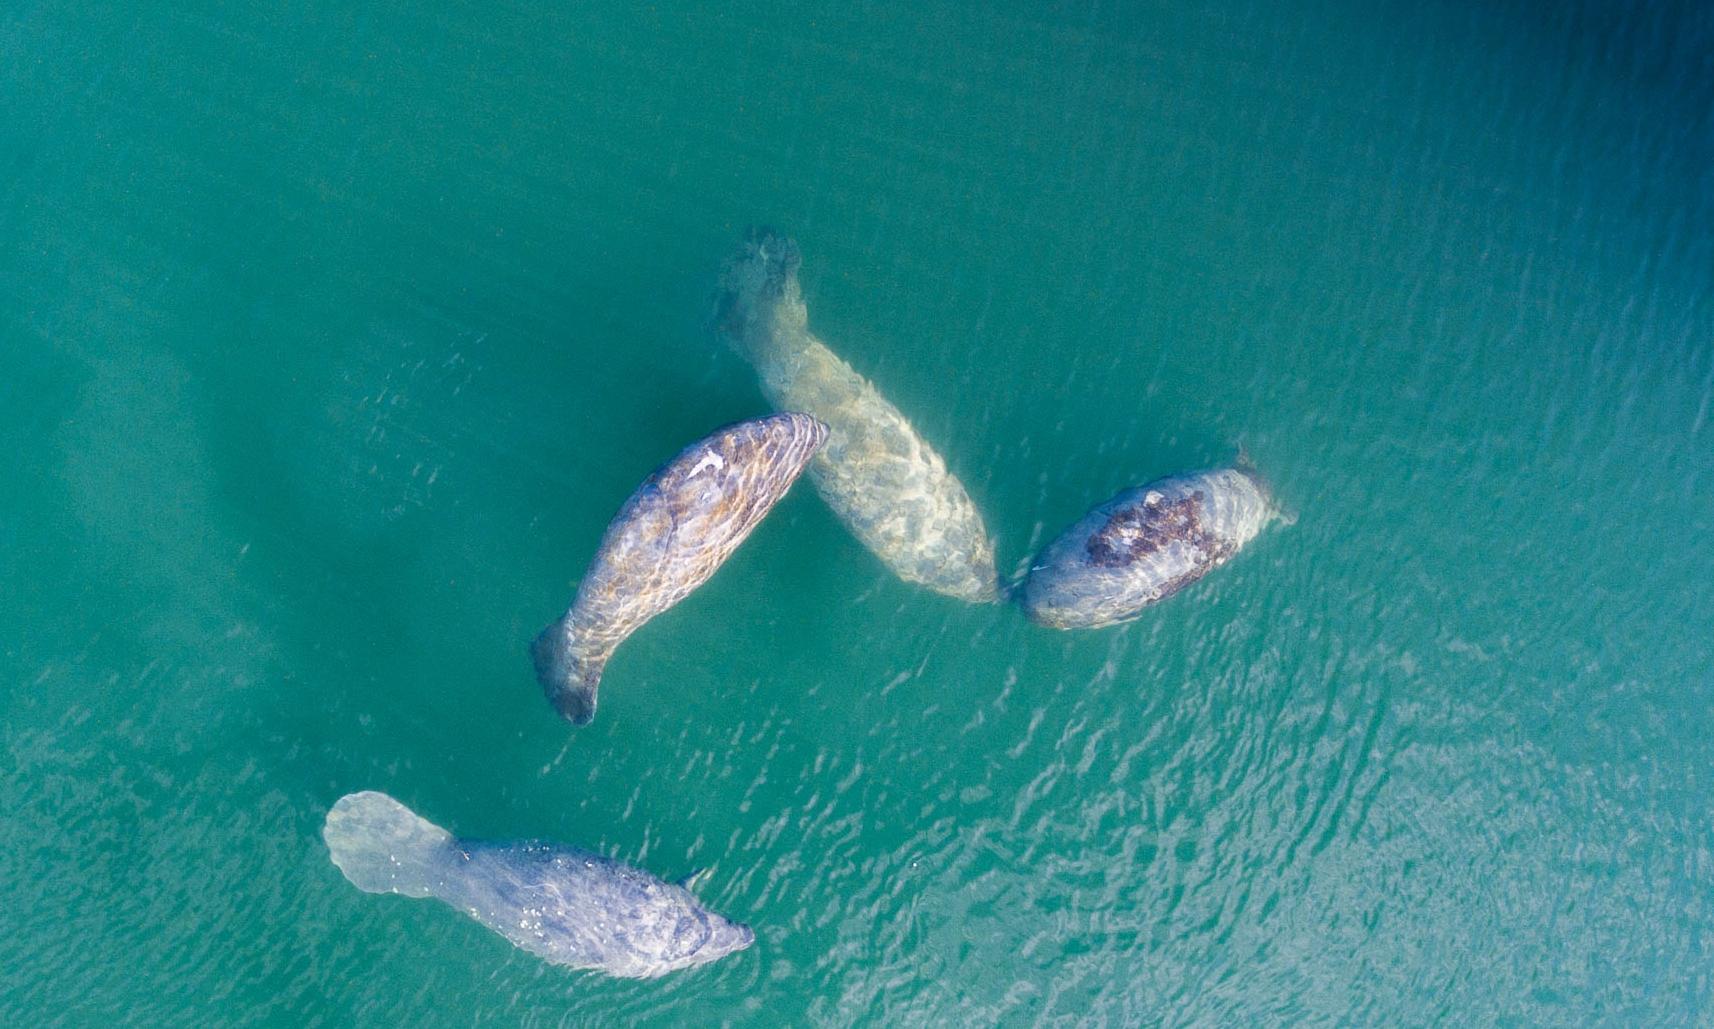 MANATEES, FLORIDA credit: DAVID GROSS / coral reef image bank